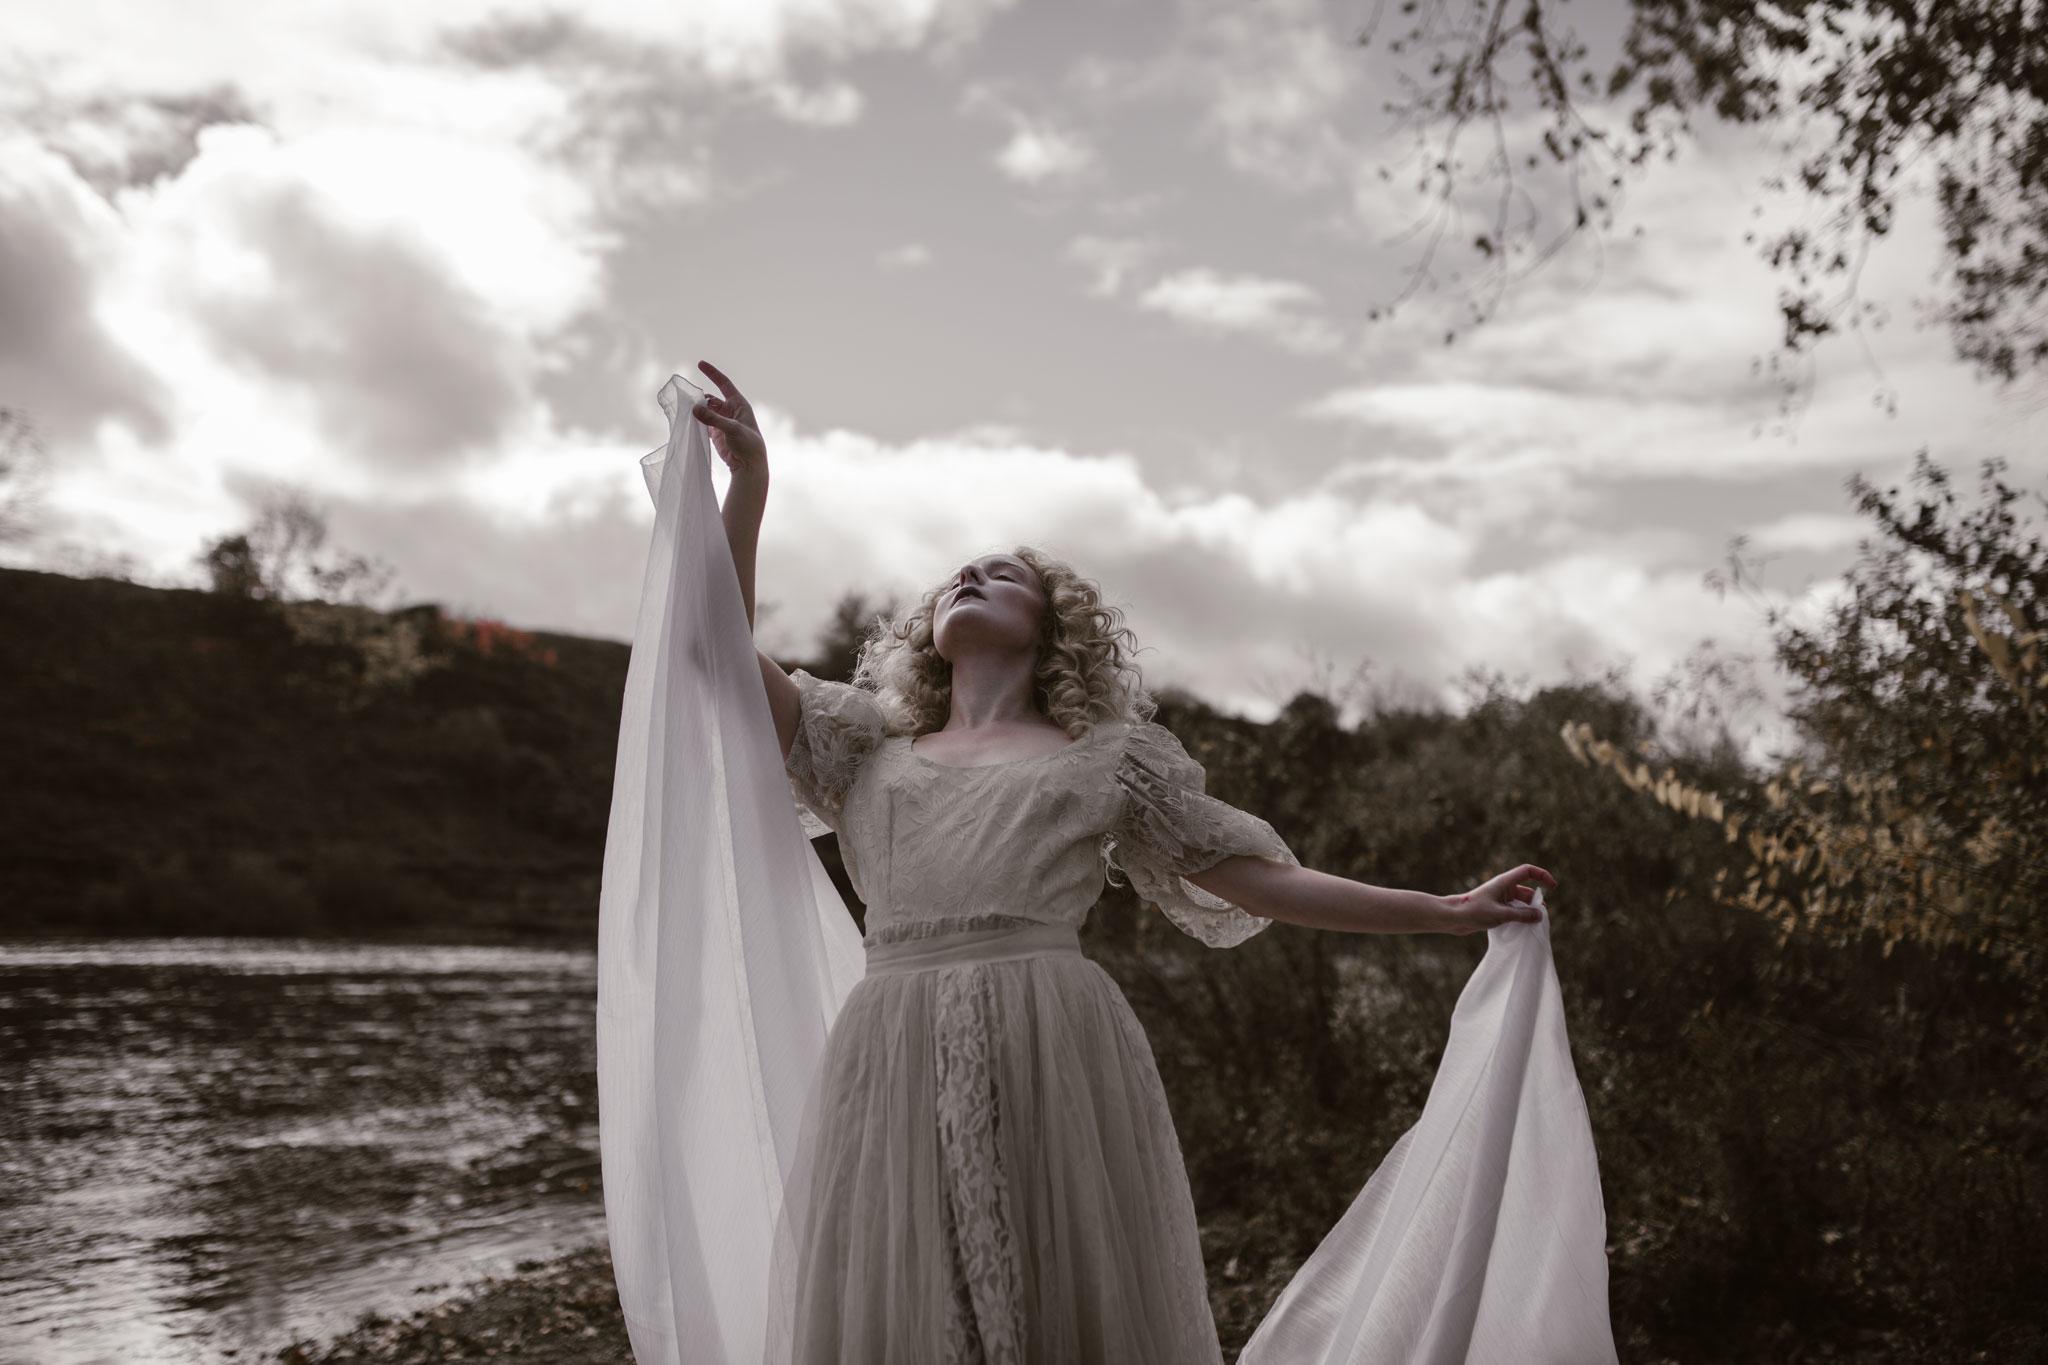 pale-witch-213fb.jpg